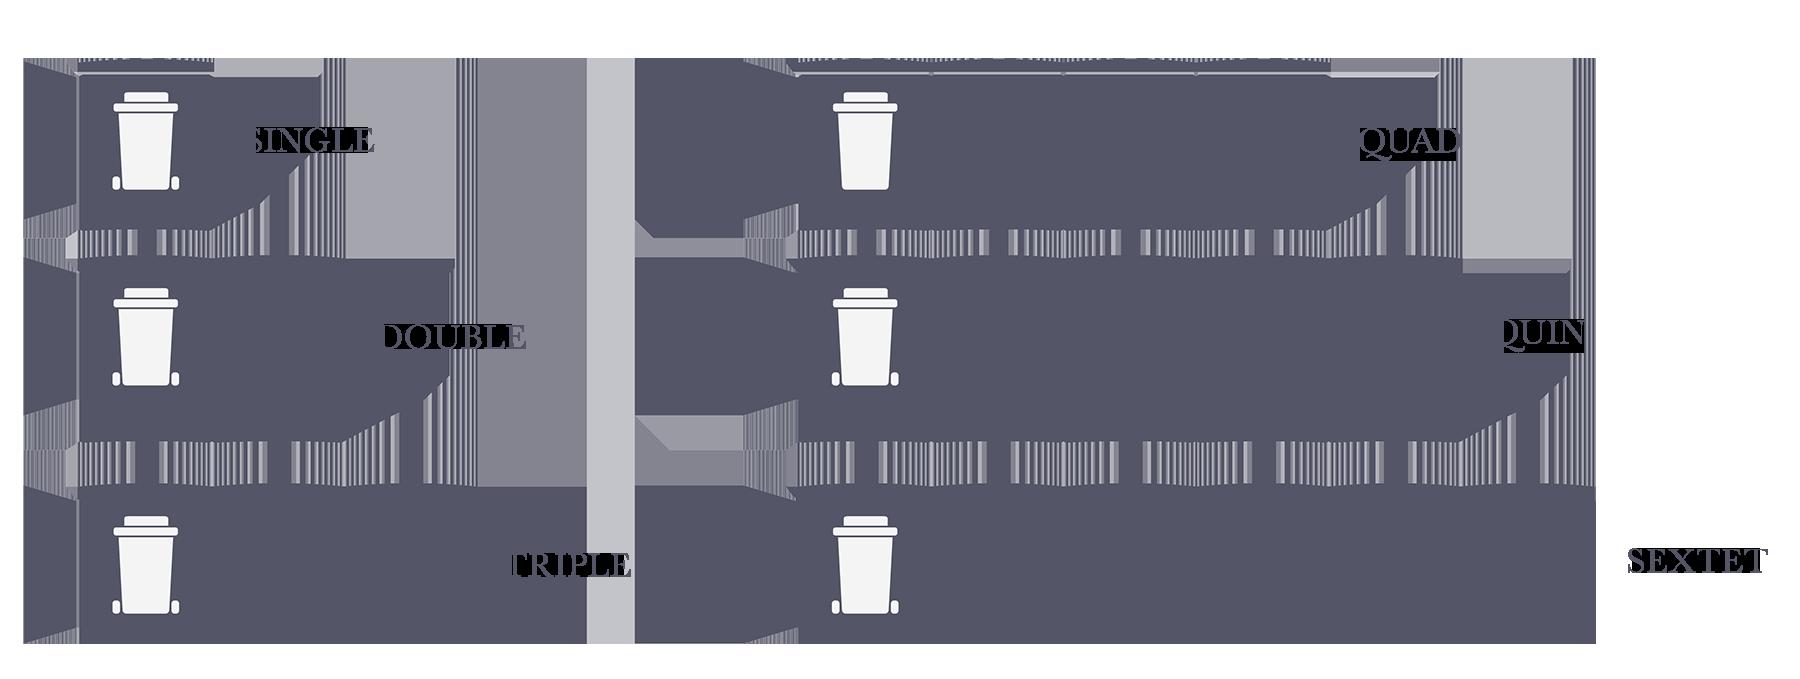 Store Sizes